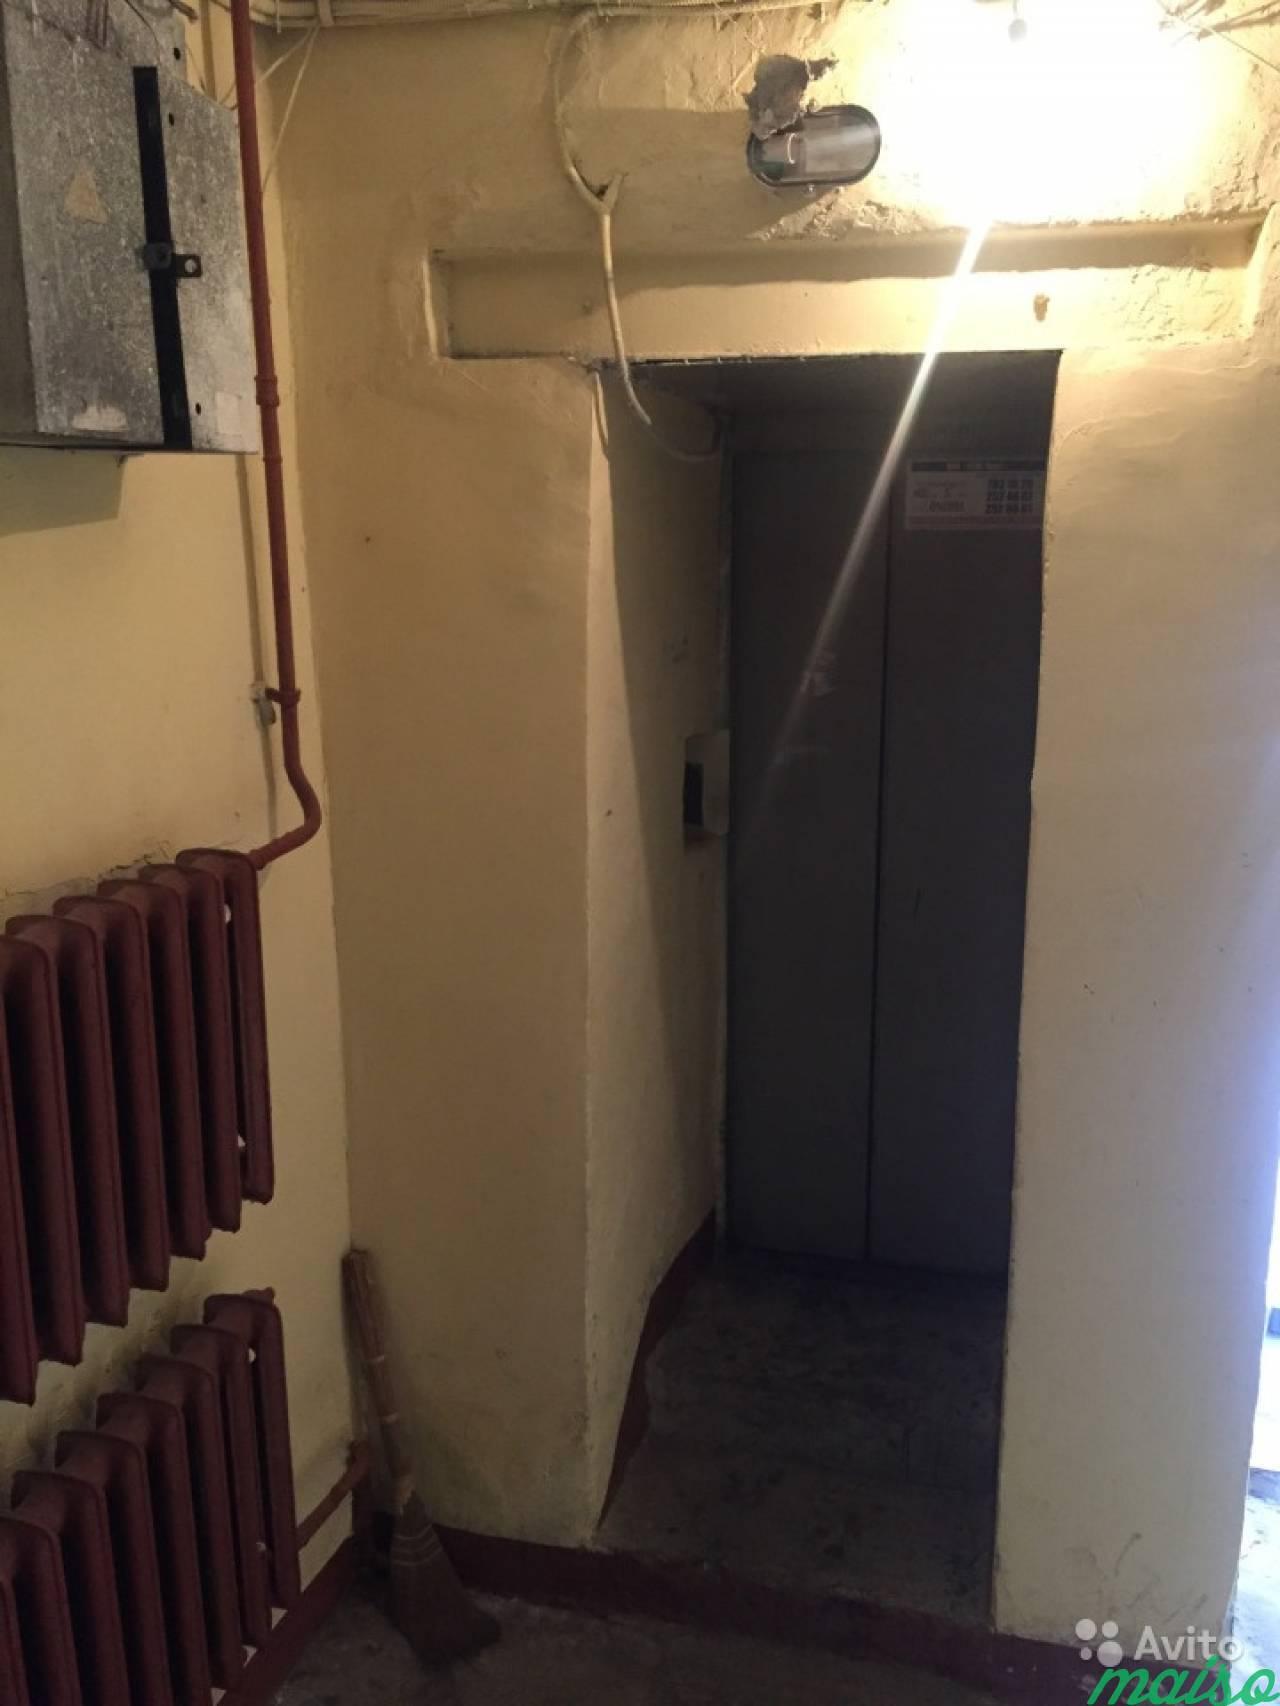 Комната 18.5 м² в 4-к, 5/6 эт. в Санкт-Петербурге. Фото 8